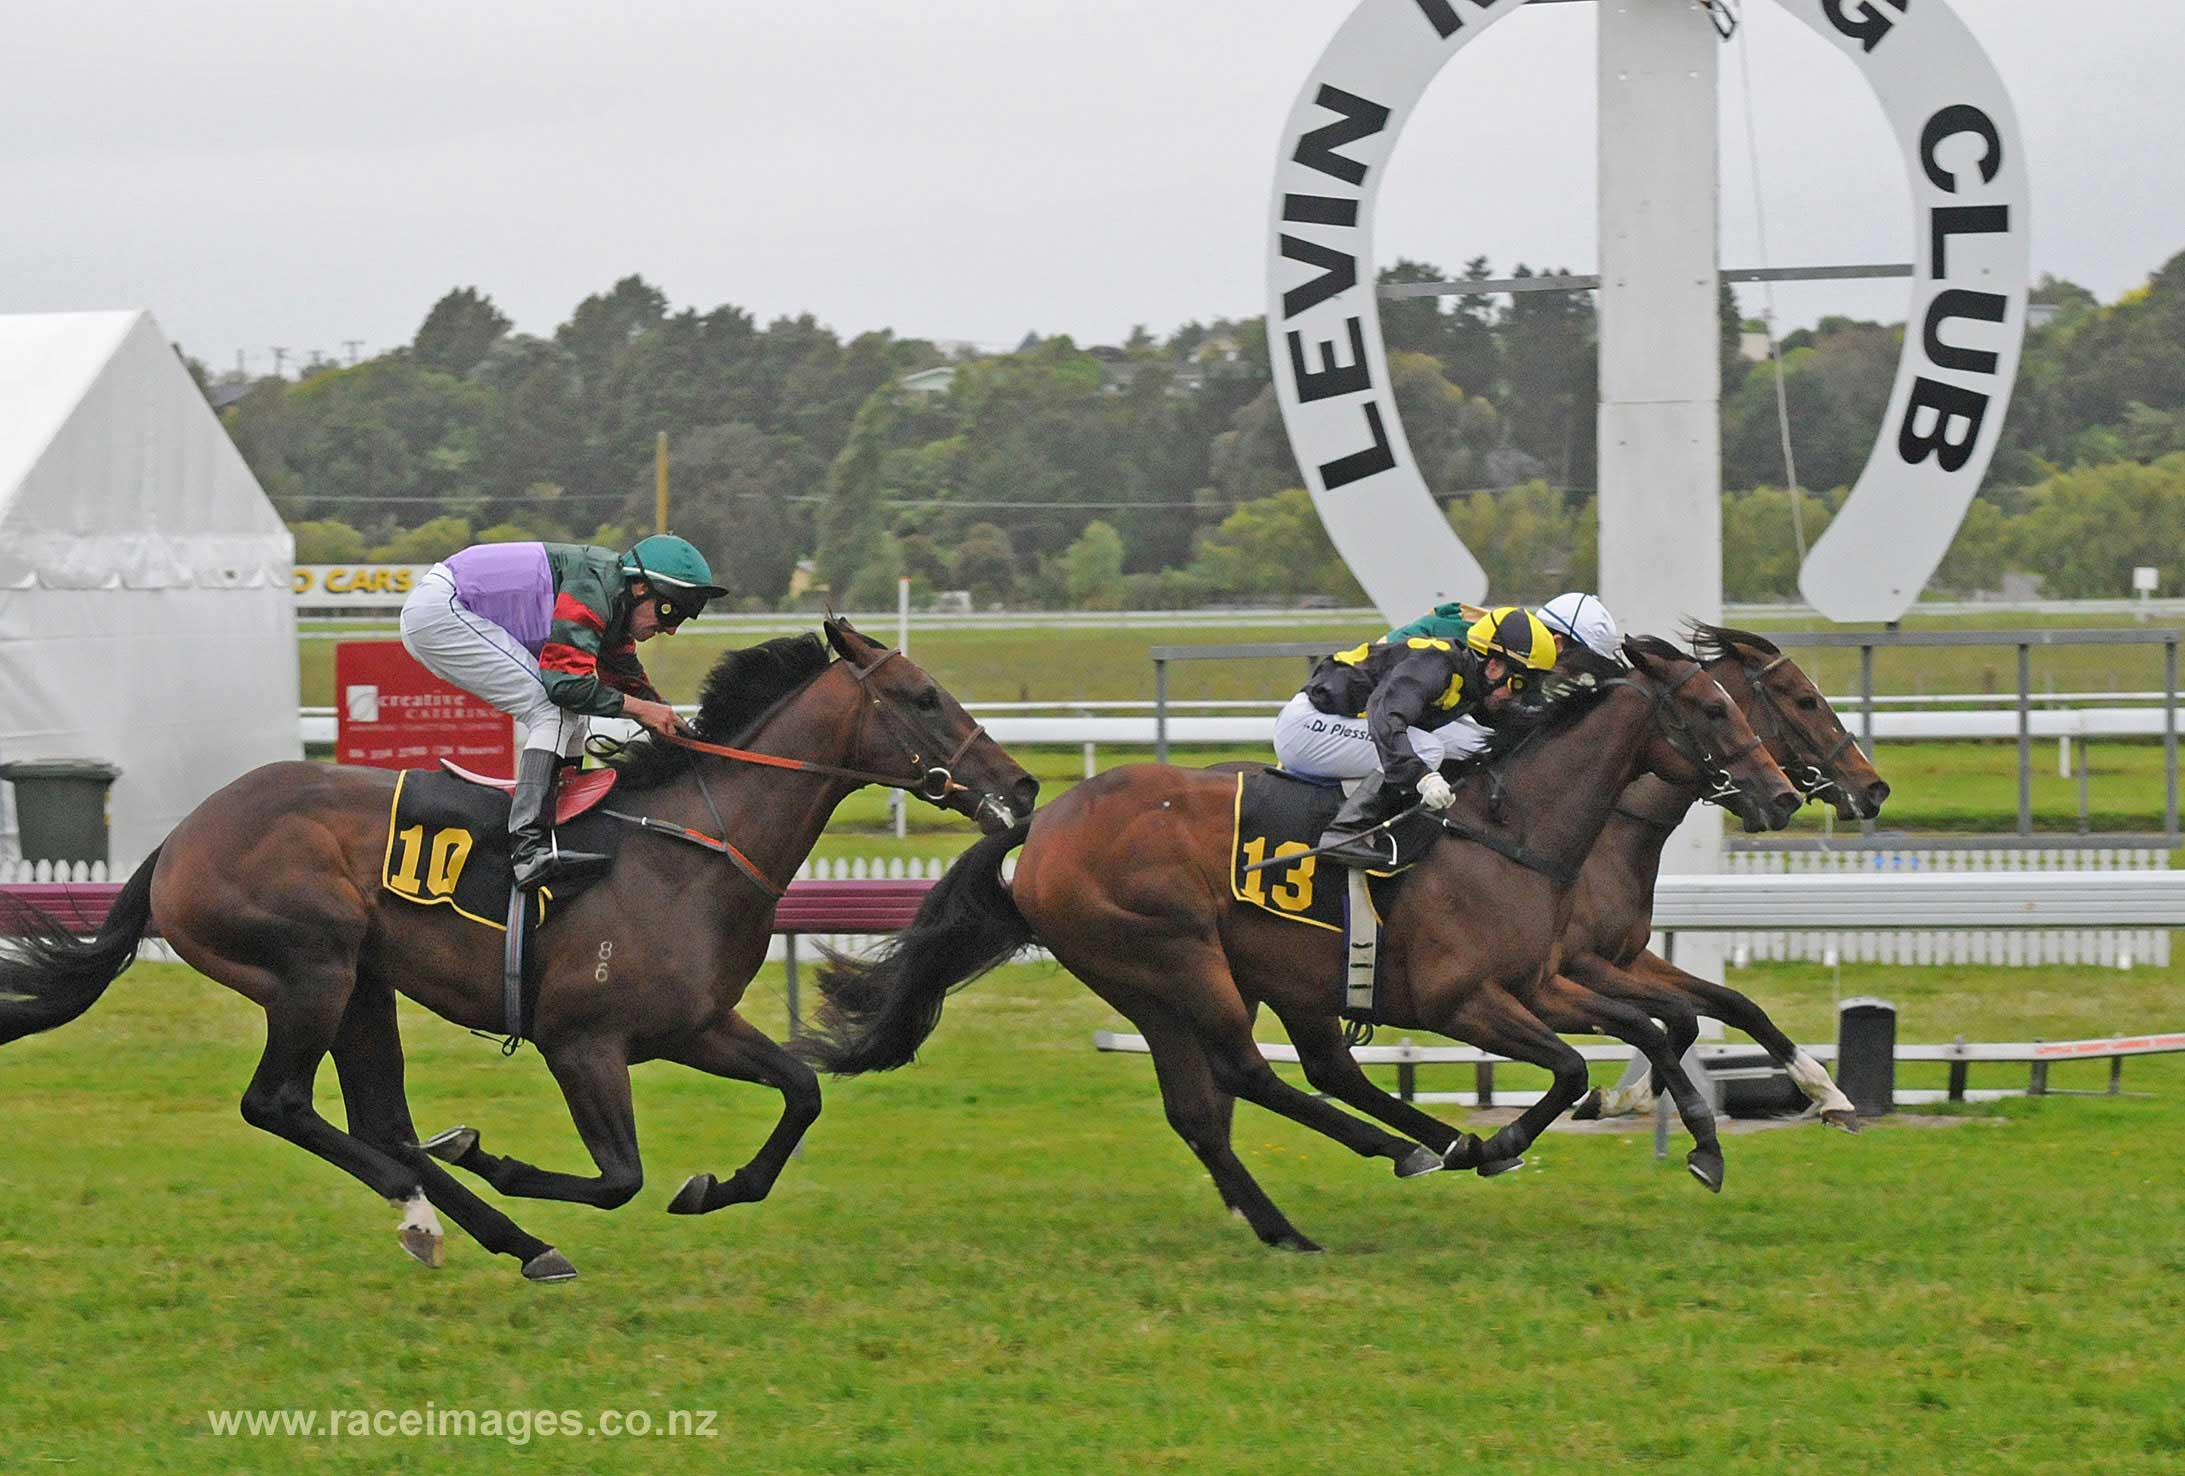 horse-racing-2009.jpg